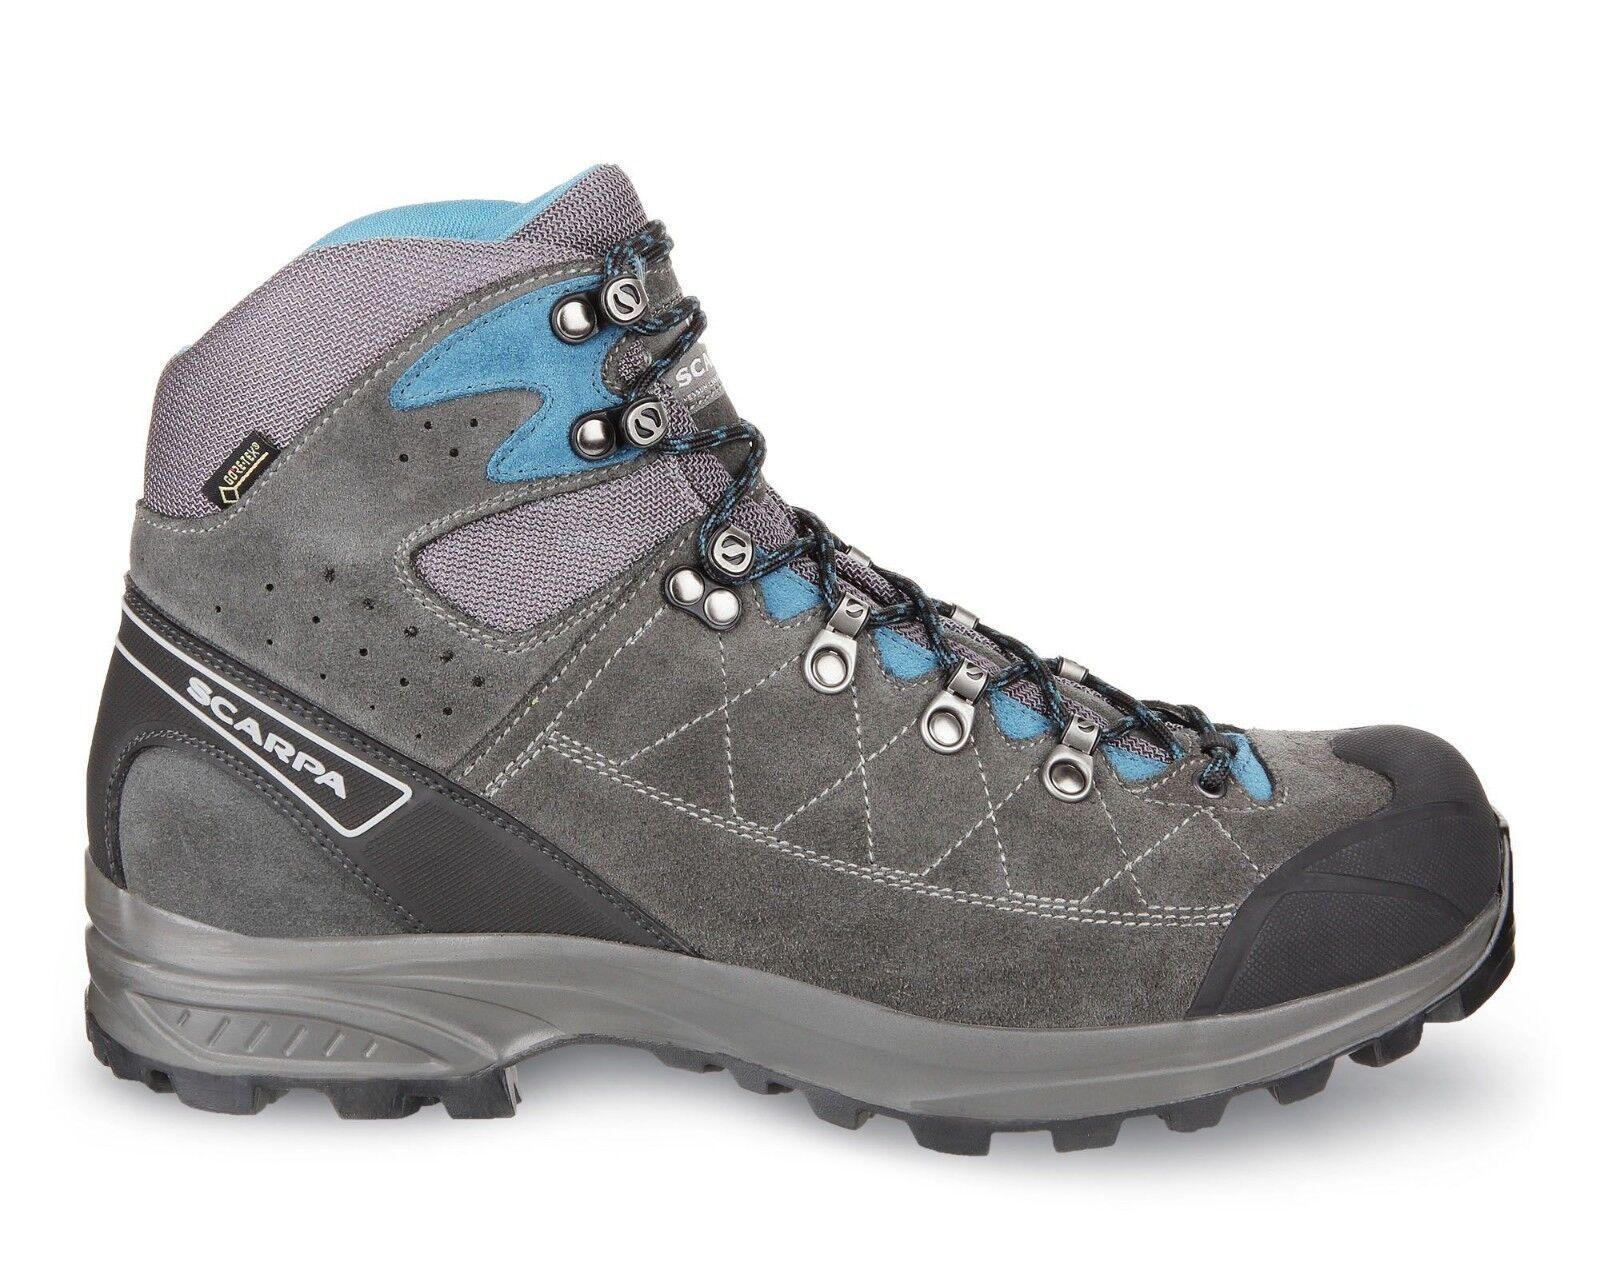 Scarpa 61056 200 Kailash Trek GTX Grey bluee Suede Gore-Tex Trail Hiking Boots